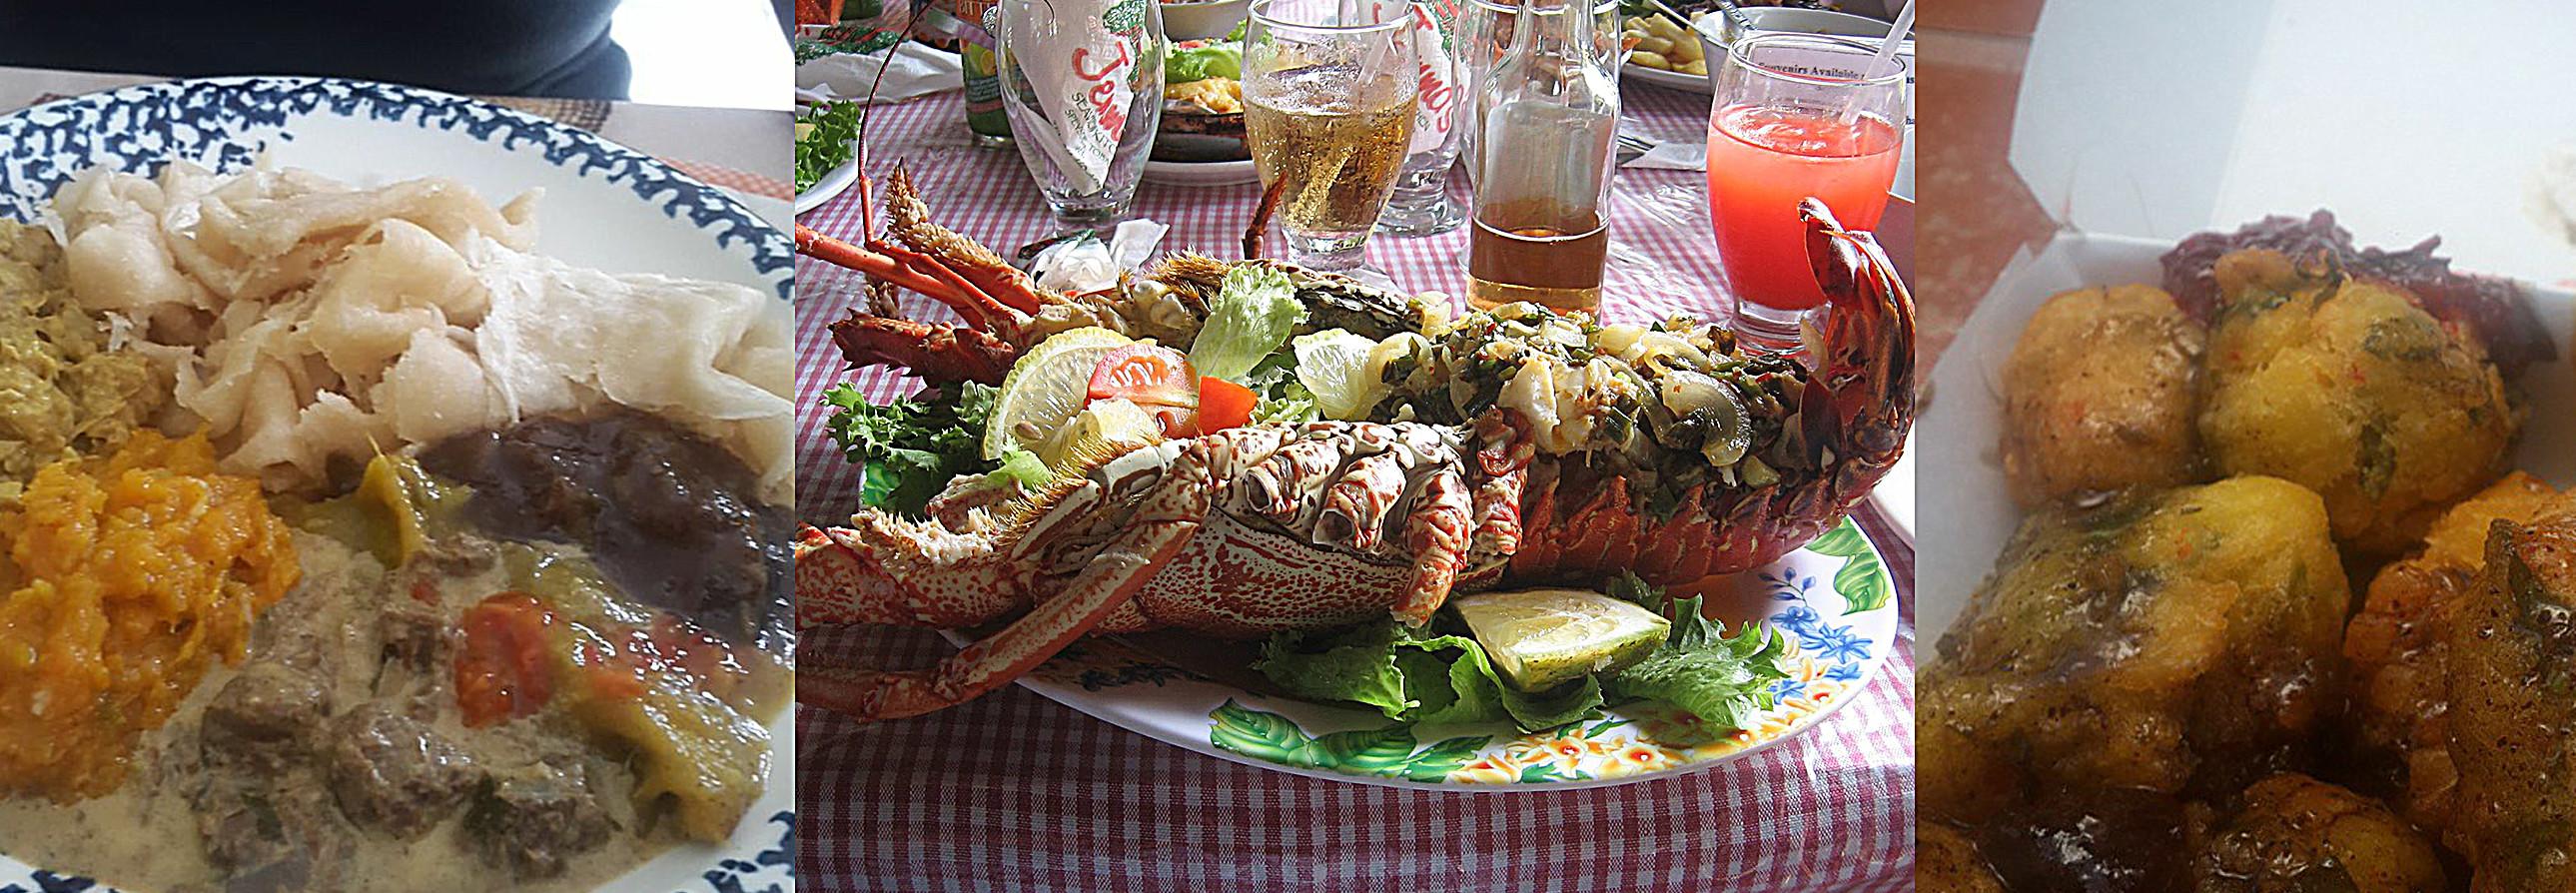 nightlife and cuisine